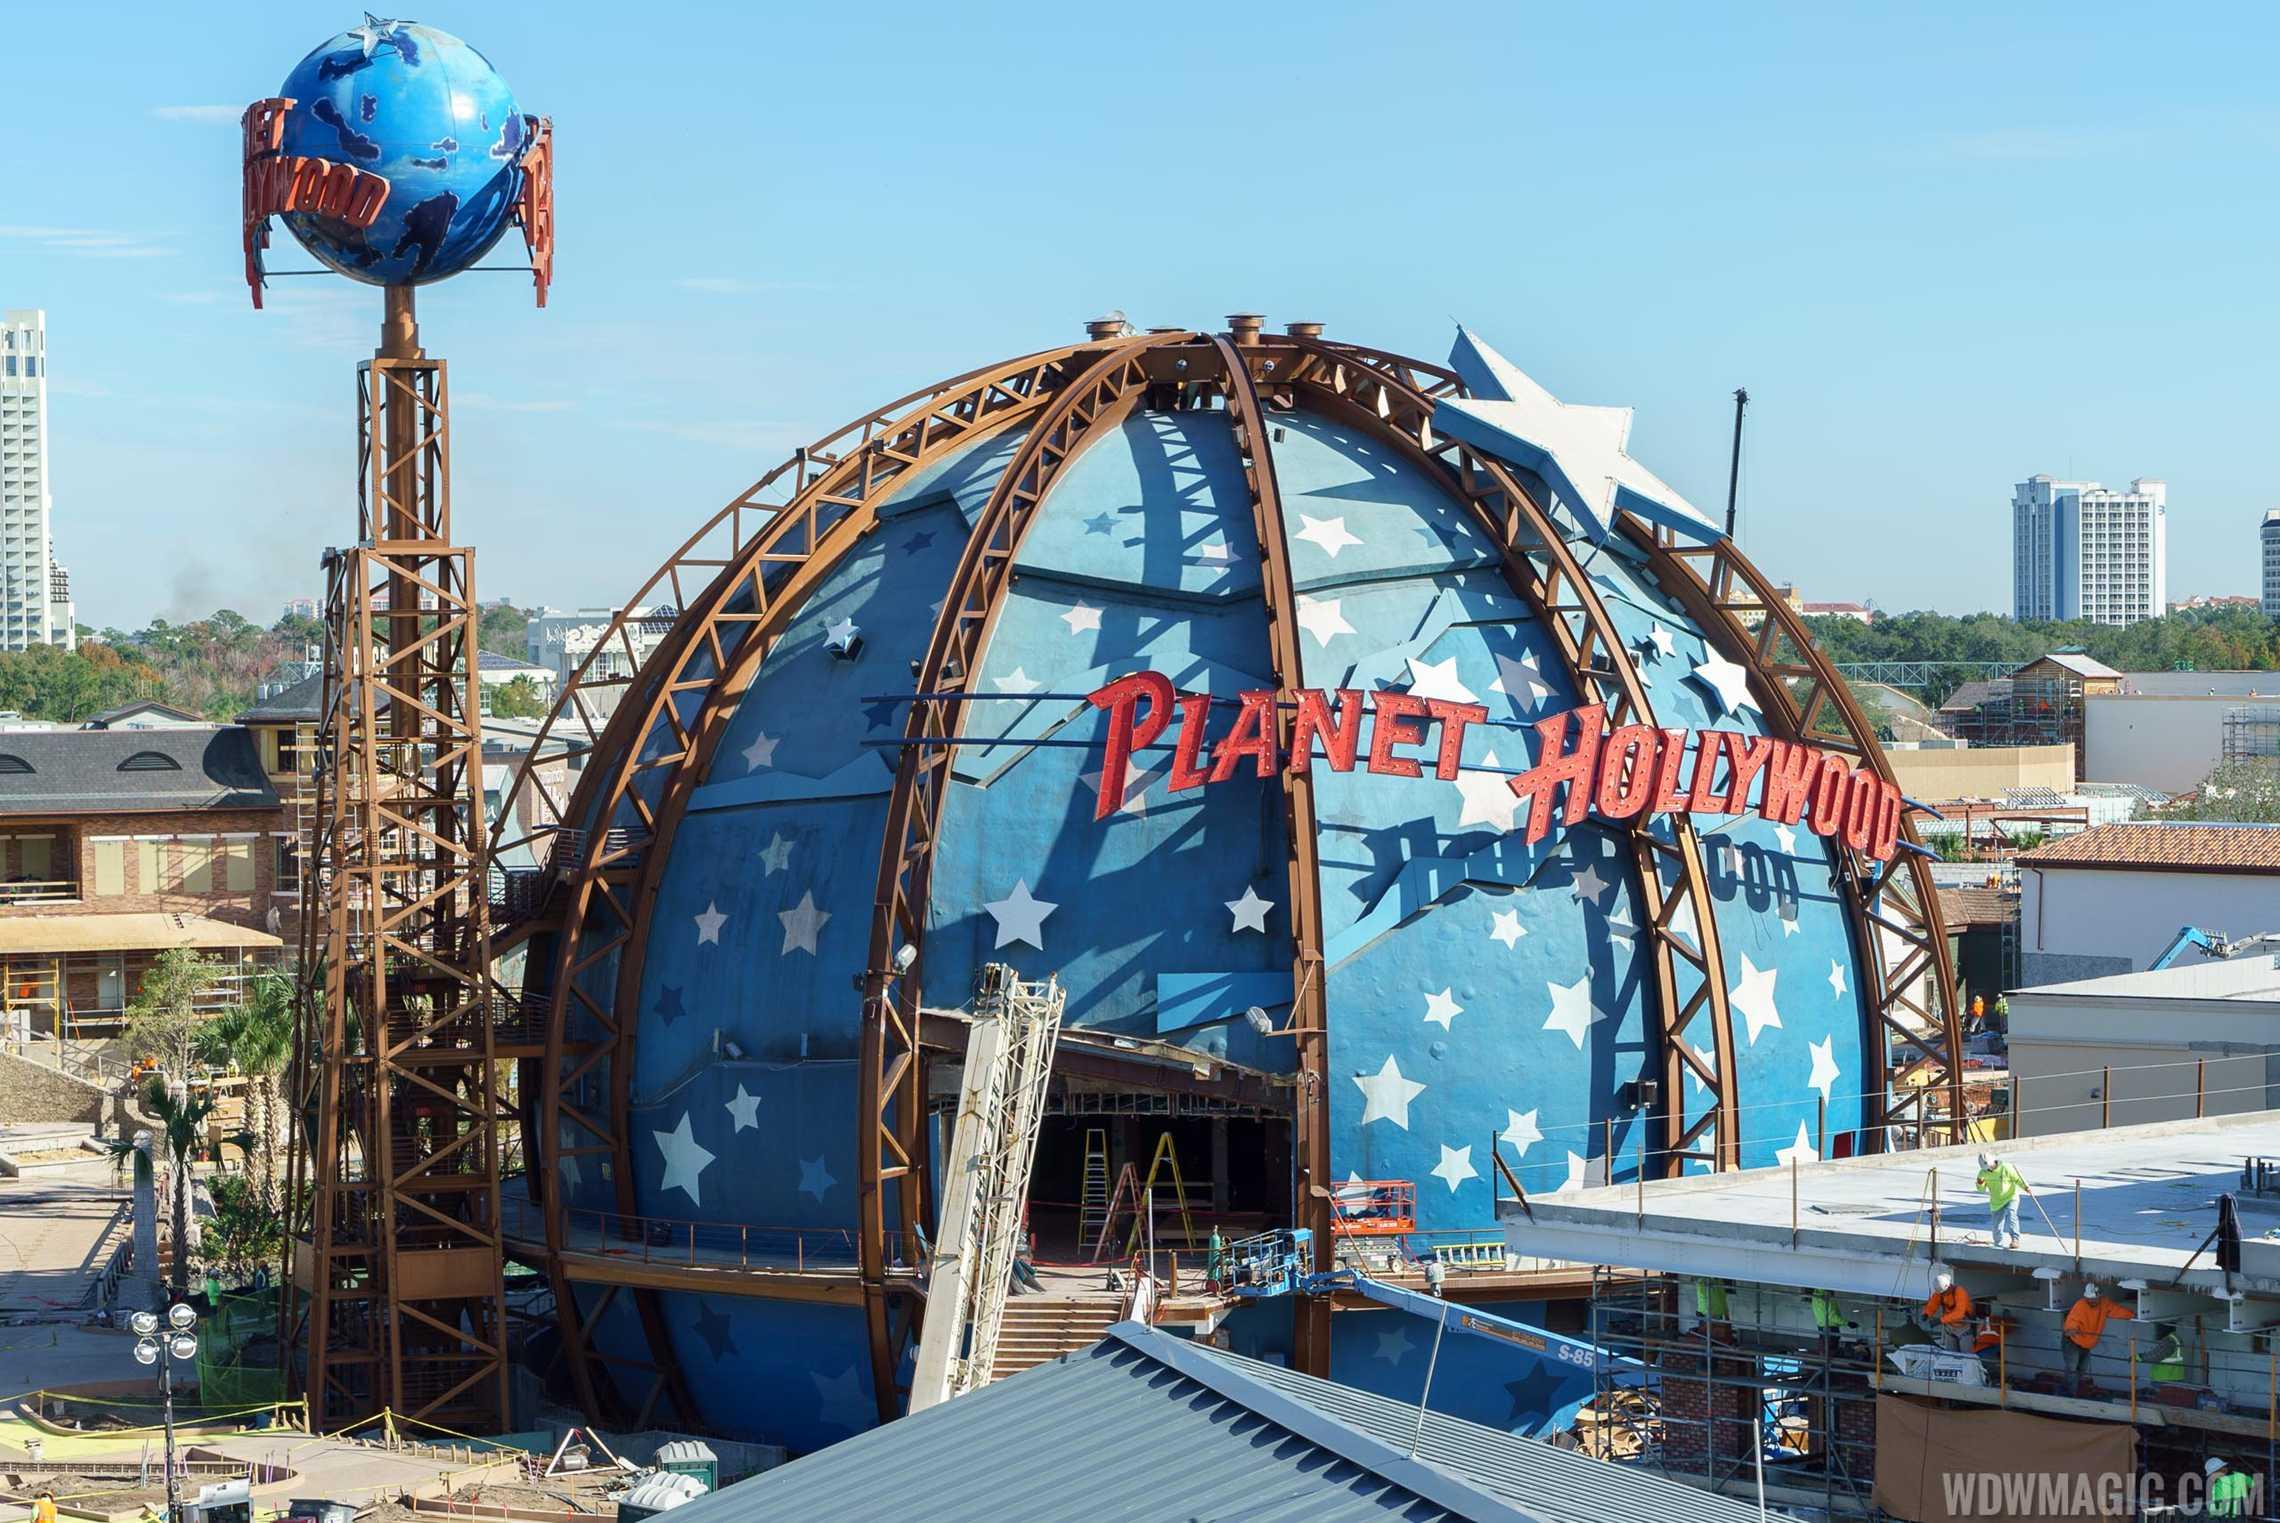 Planet Hollywood In Myrtle Beach Menu